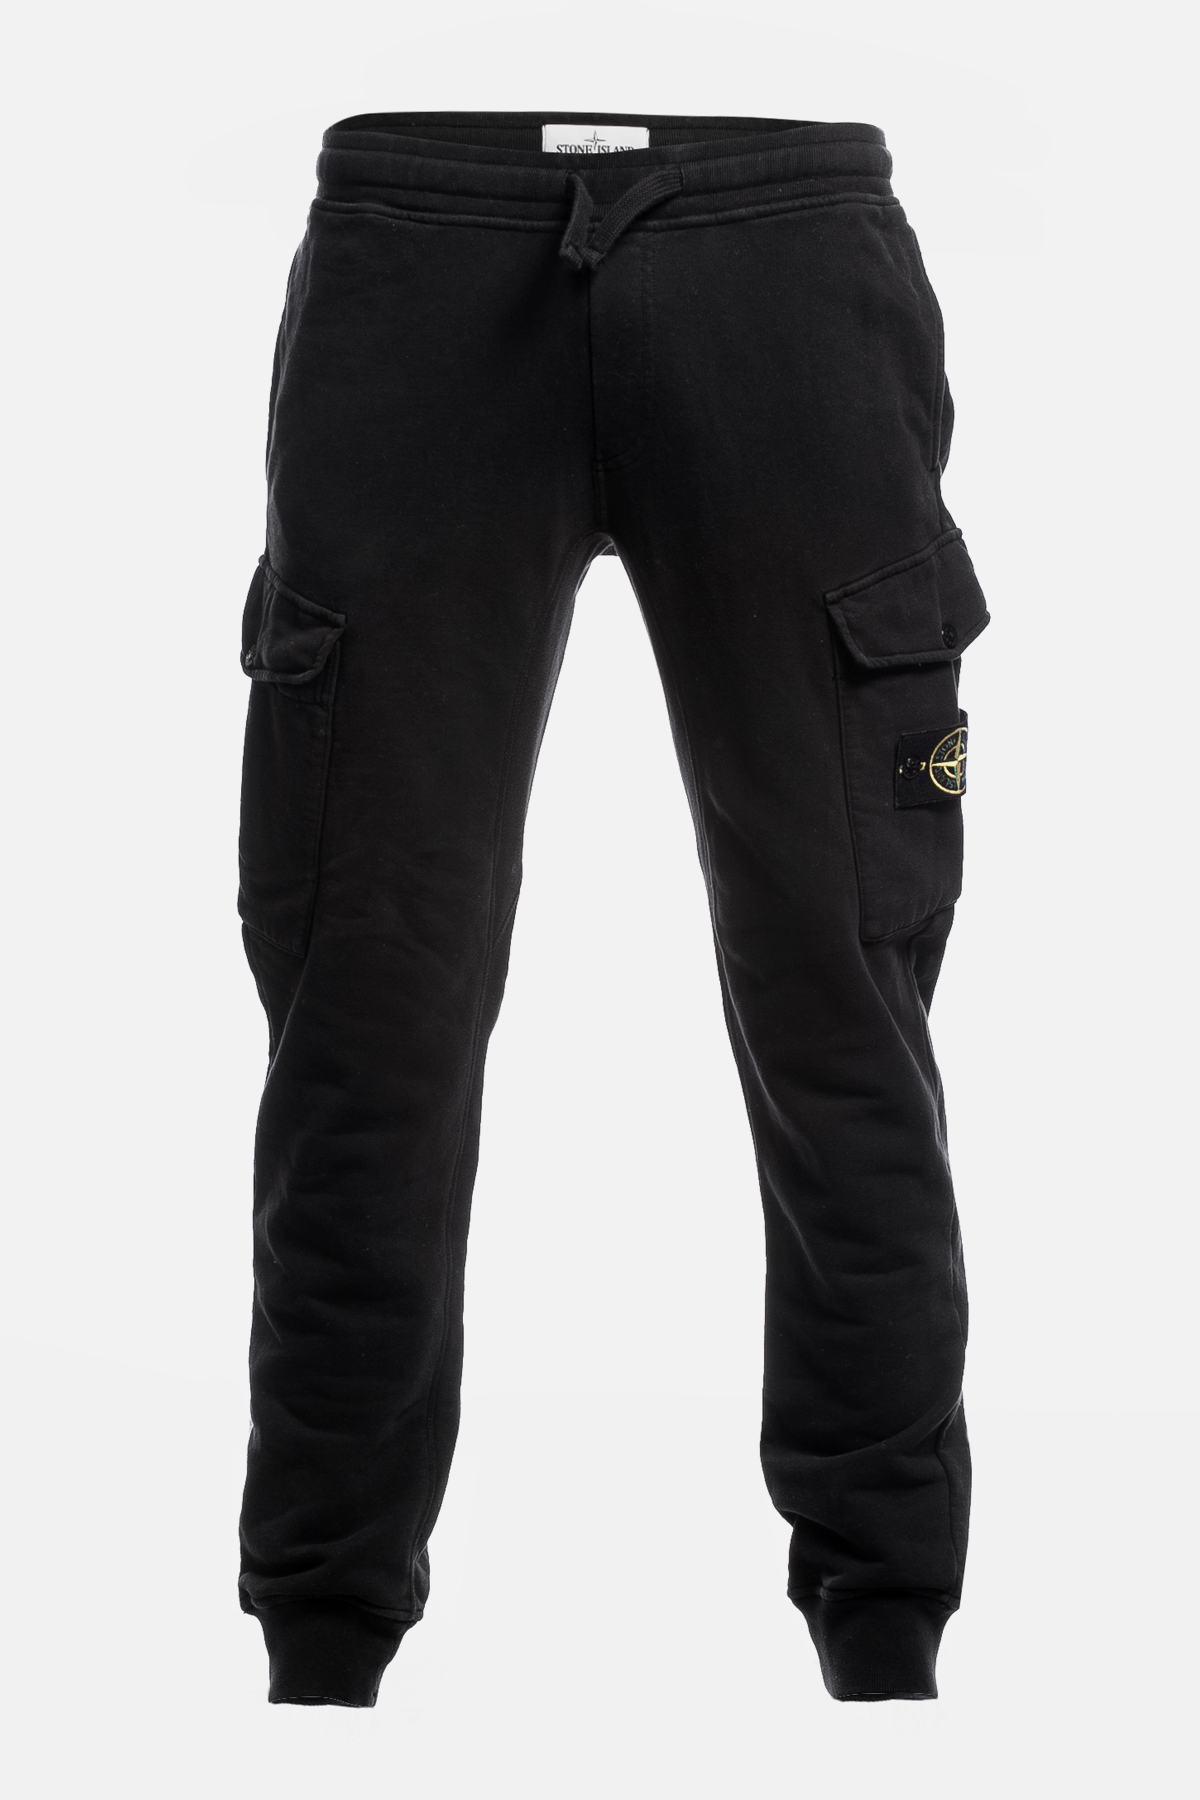 Garment Dyed Sweatpants